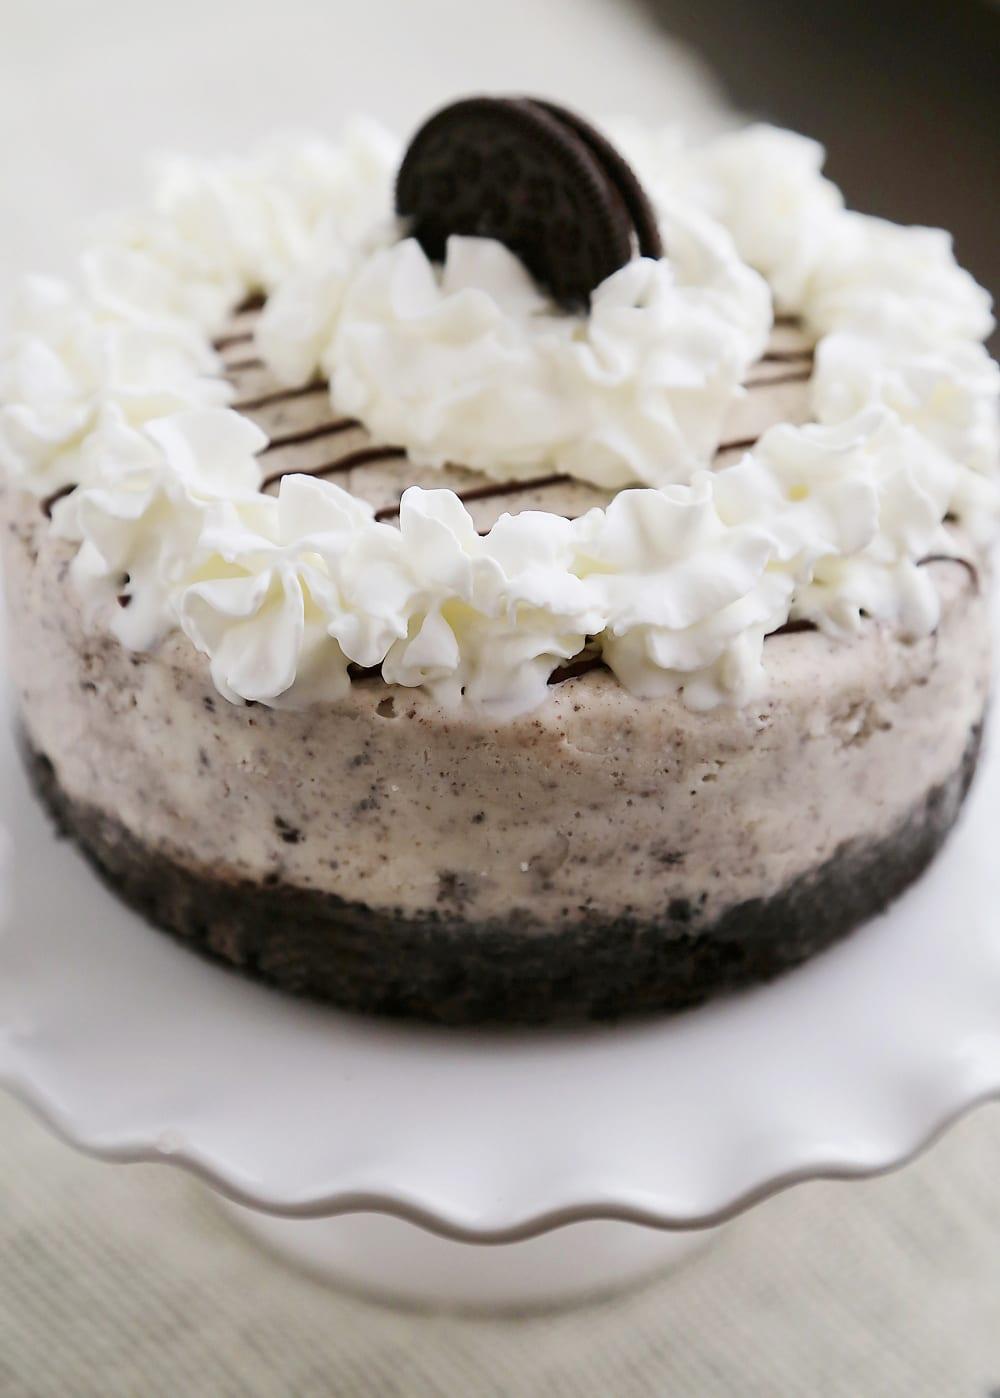 Easy Cookies 'n Cream Ice Cream Cake